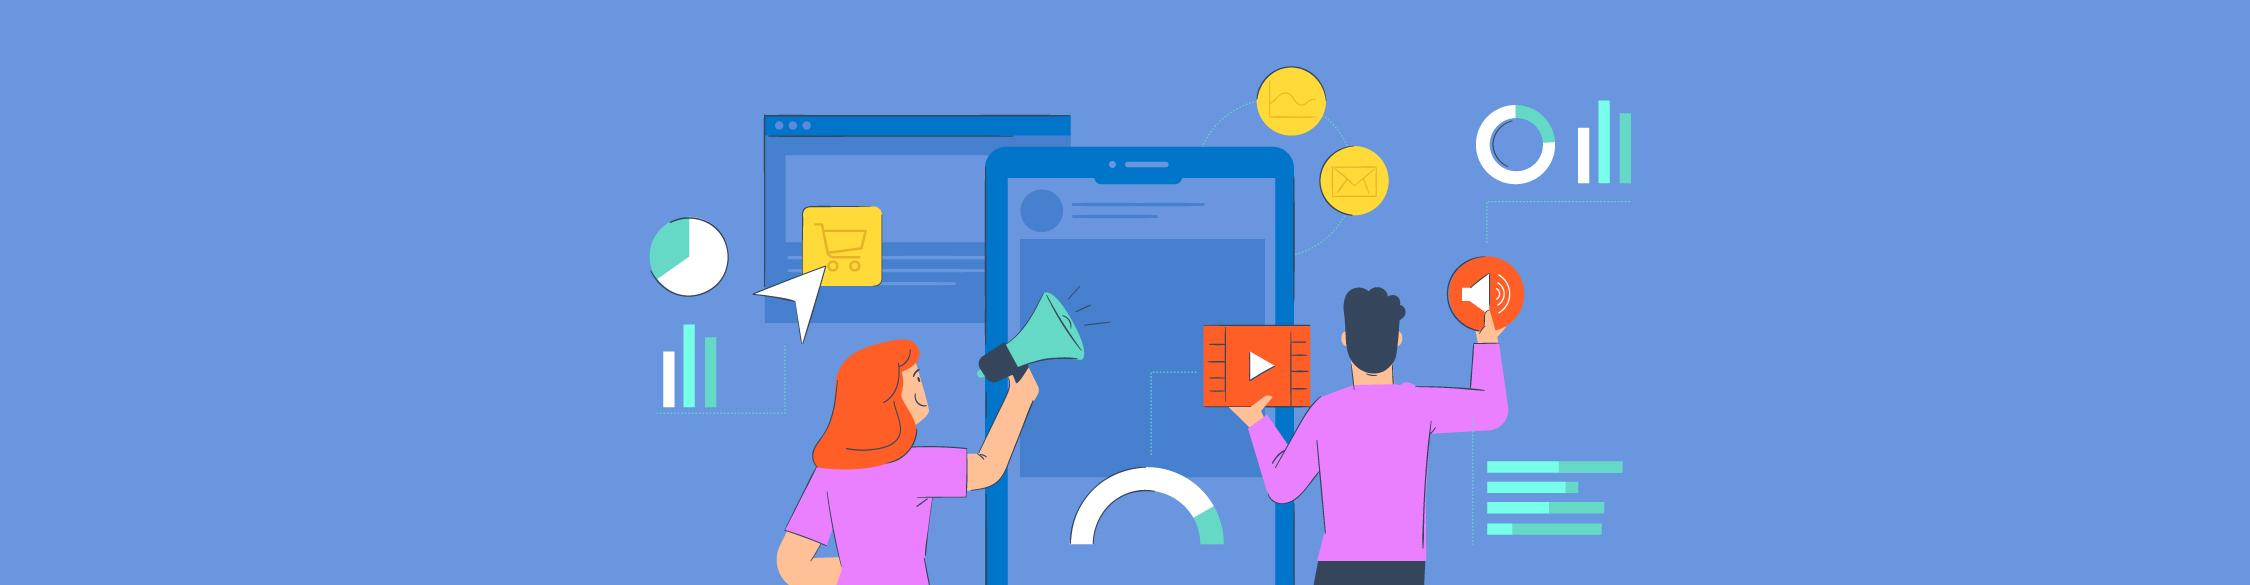 content marketing statistics - header